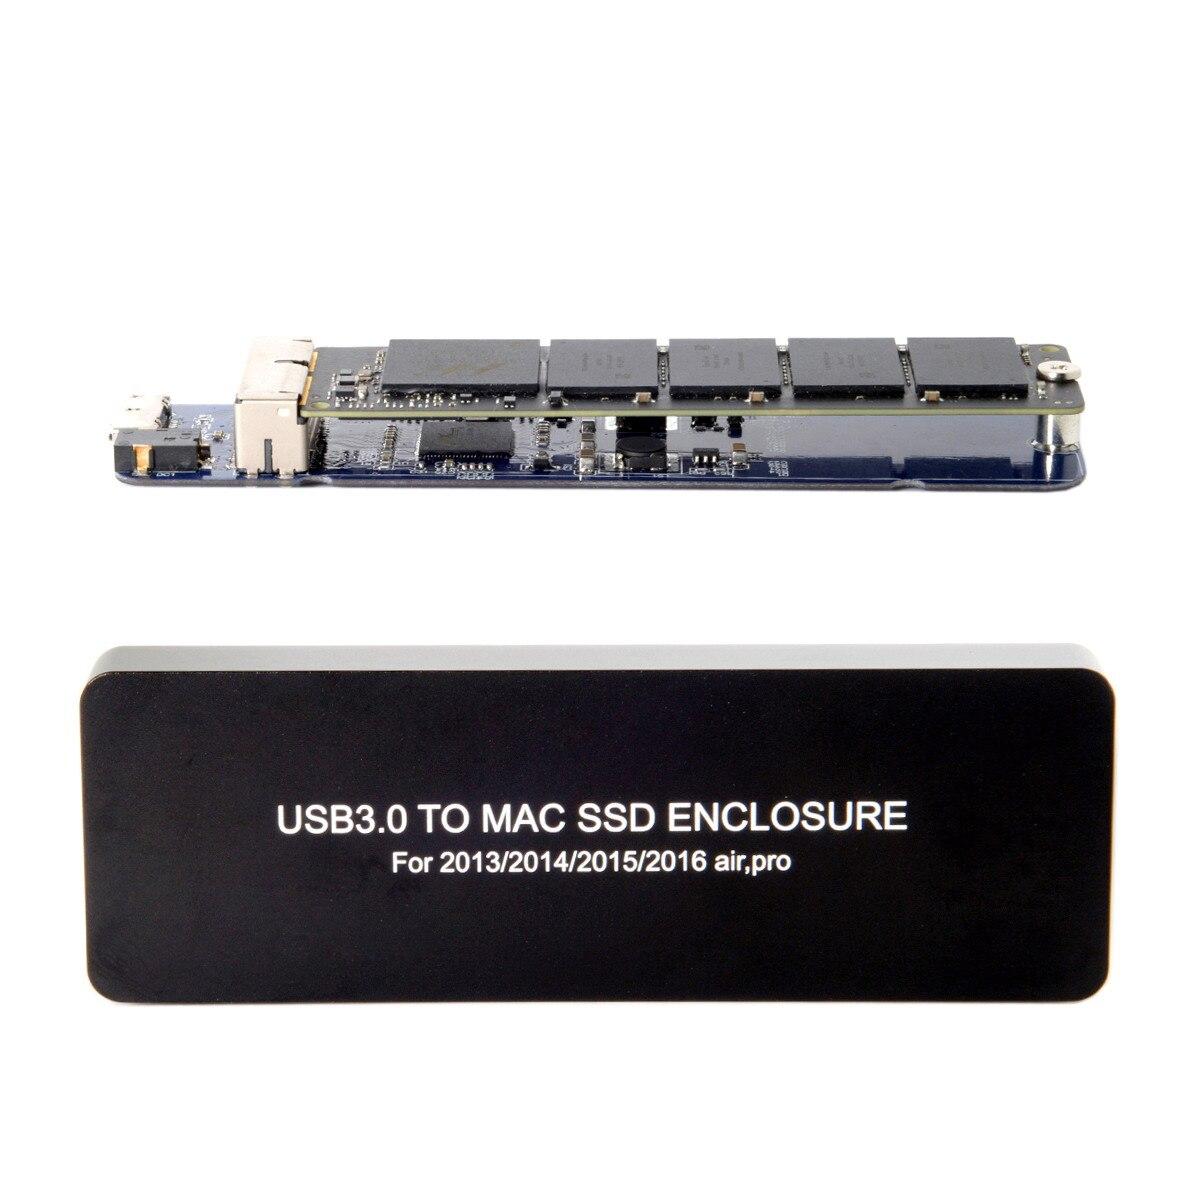 Mac book Air Pro 2013 2014 2015 2016 SSD Portable Case USB 3 0 to 16